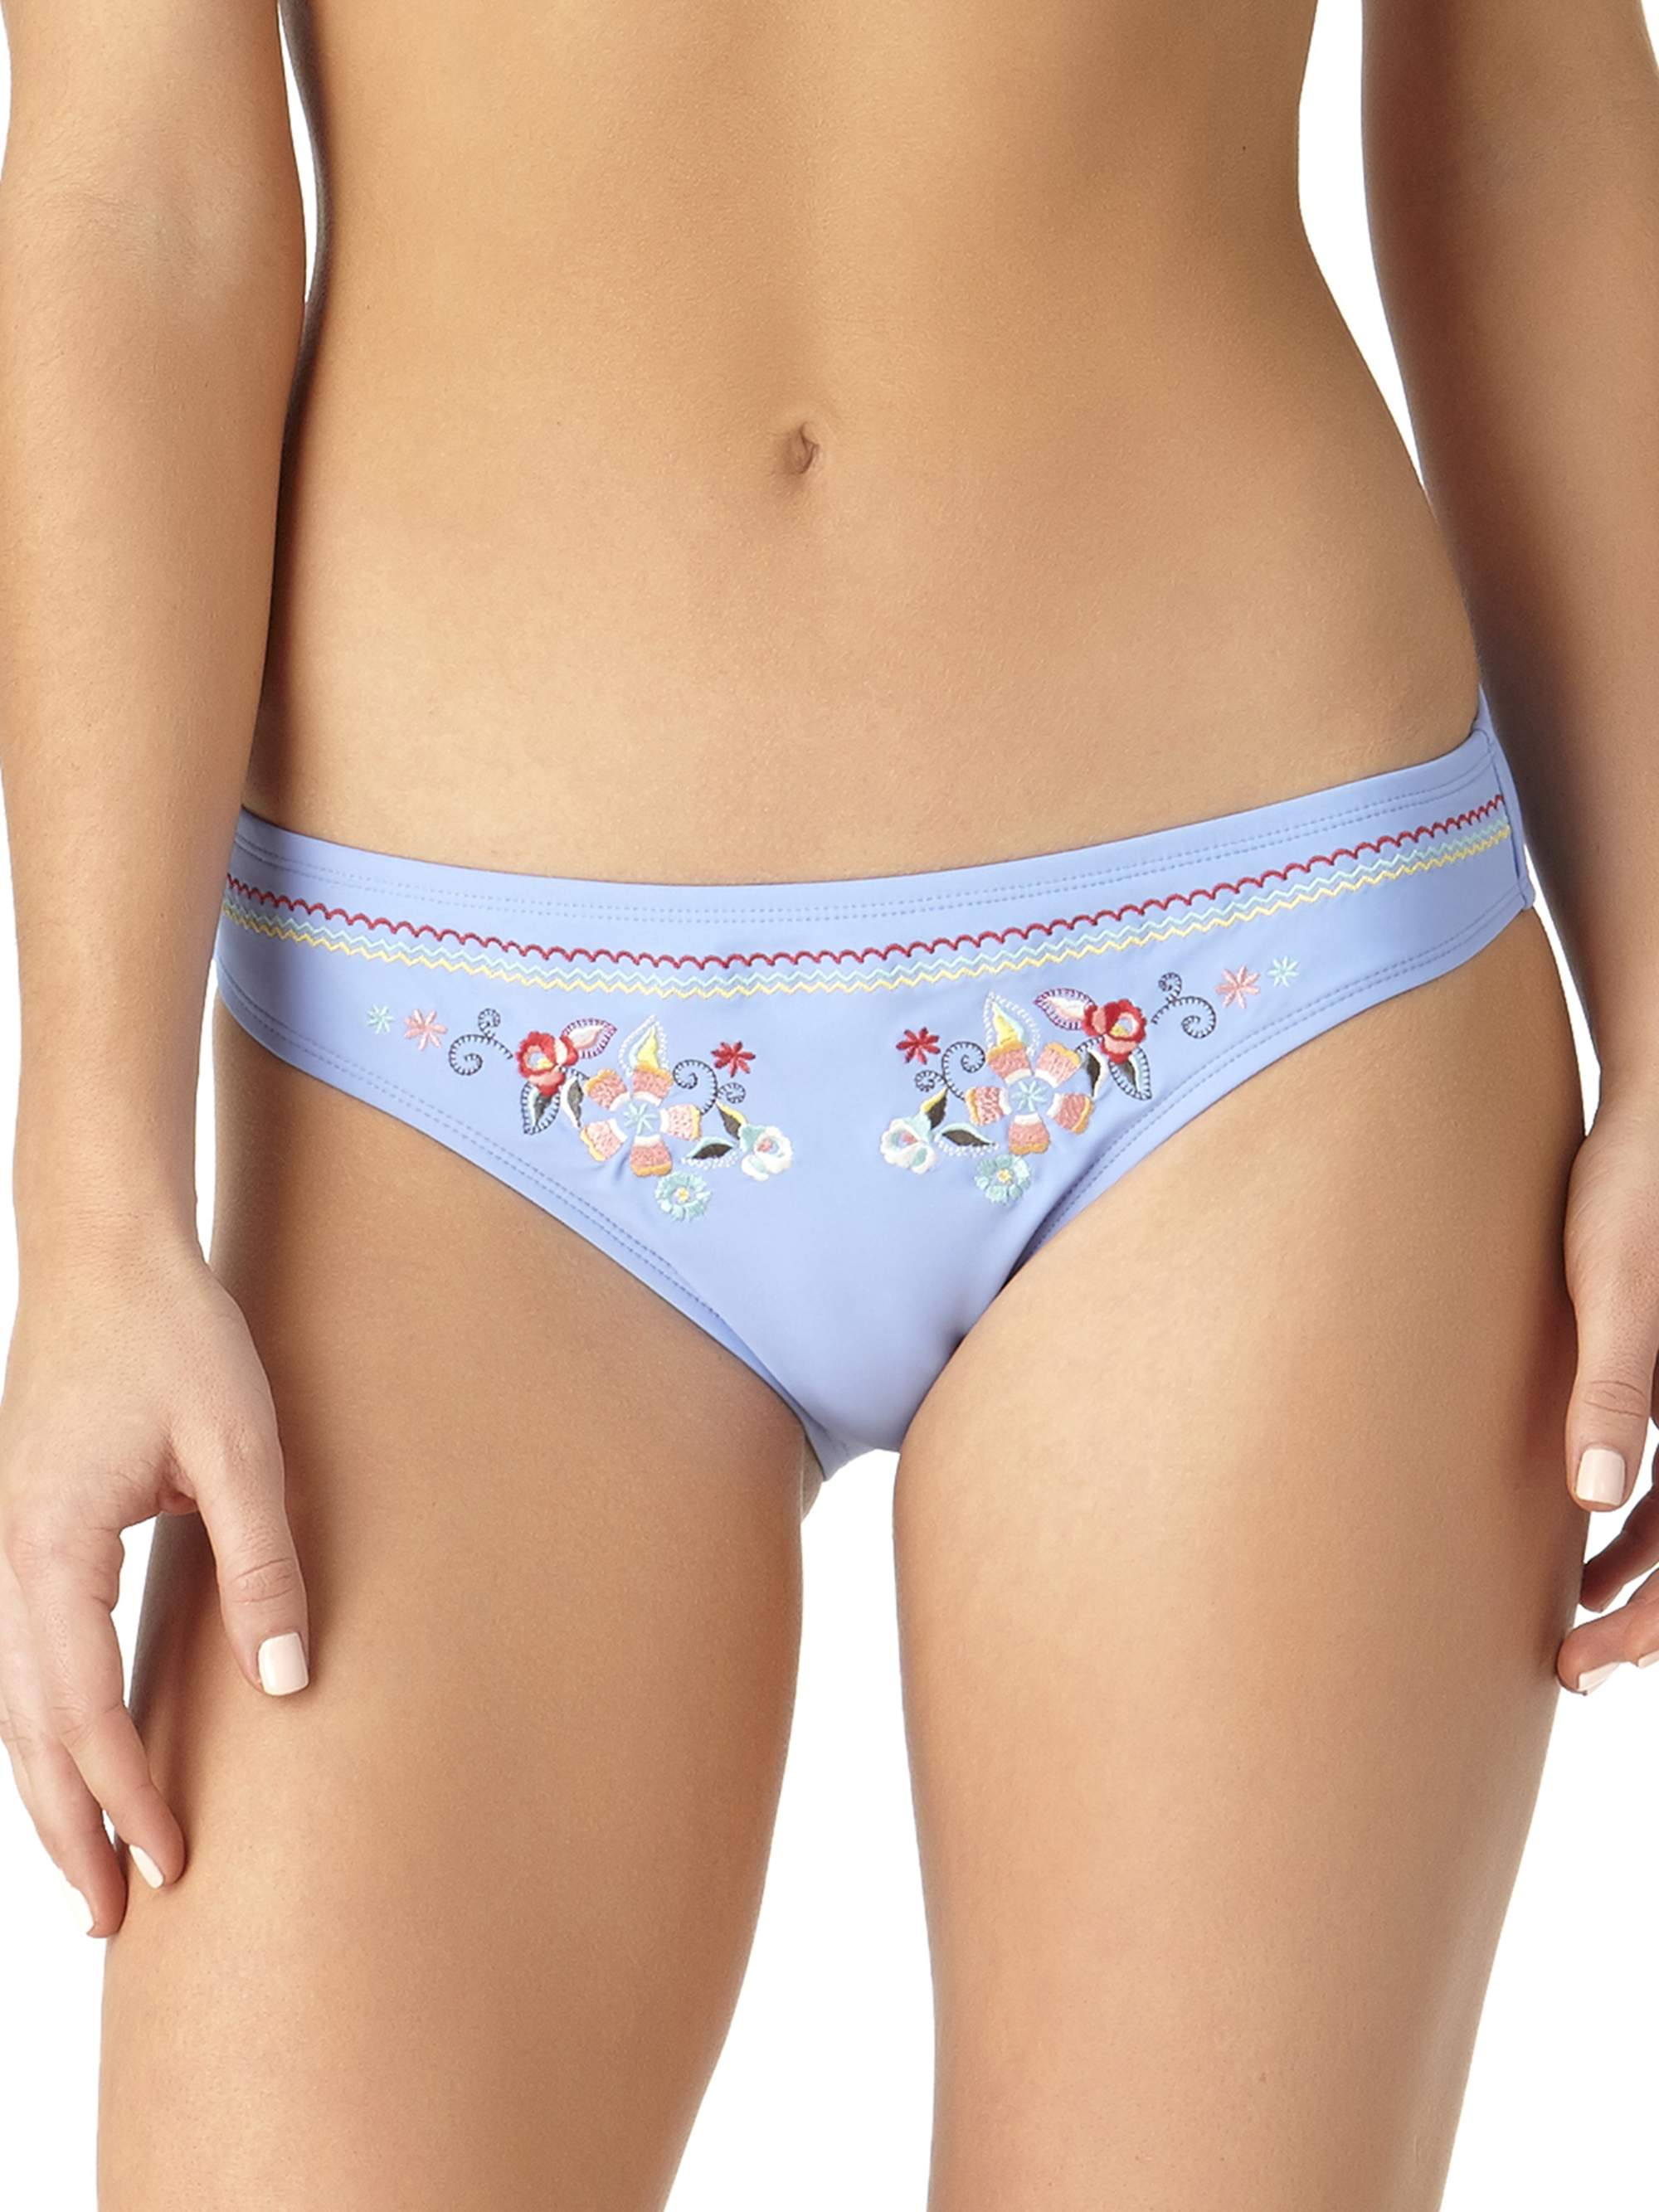 Women's Elevated Arizona Floral Swimsuit Bottom